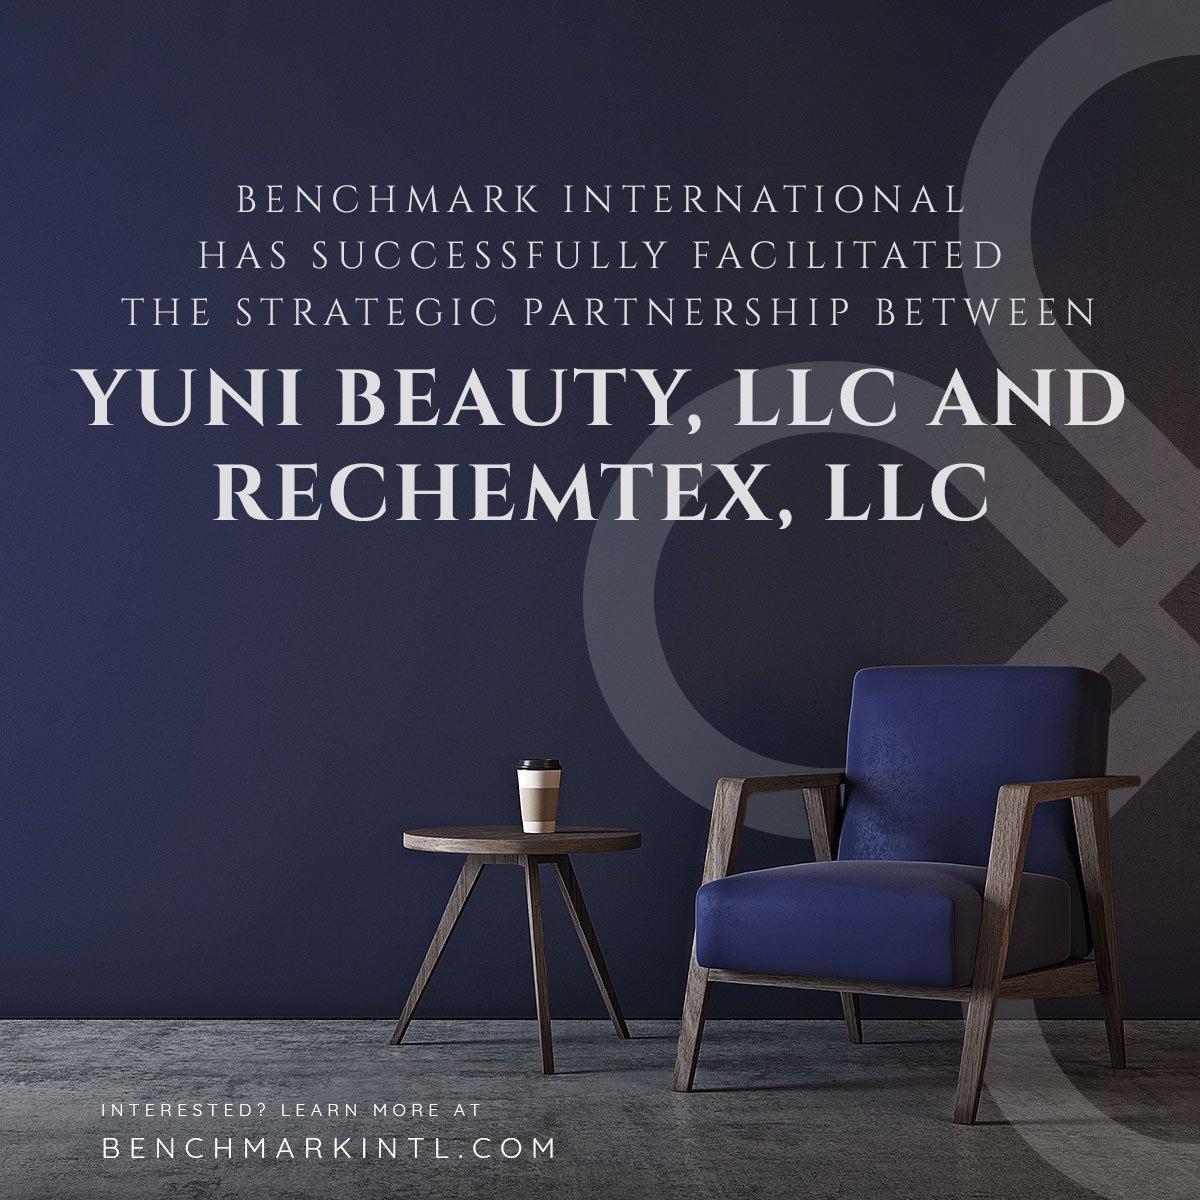 Yuni_Beauty_and_Rechemtex_Social(2)